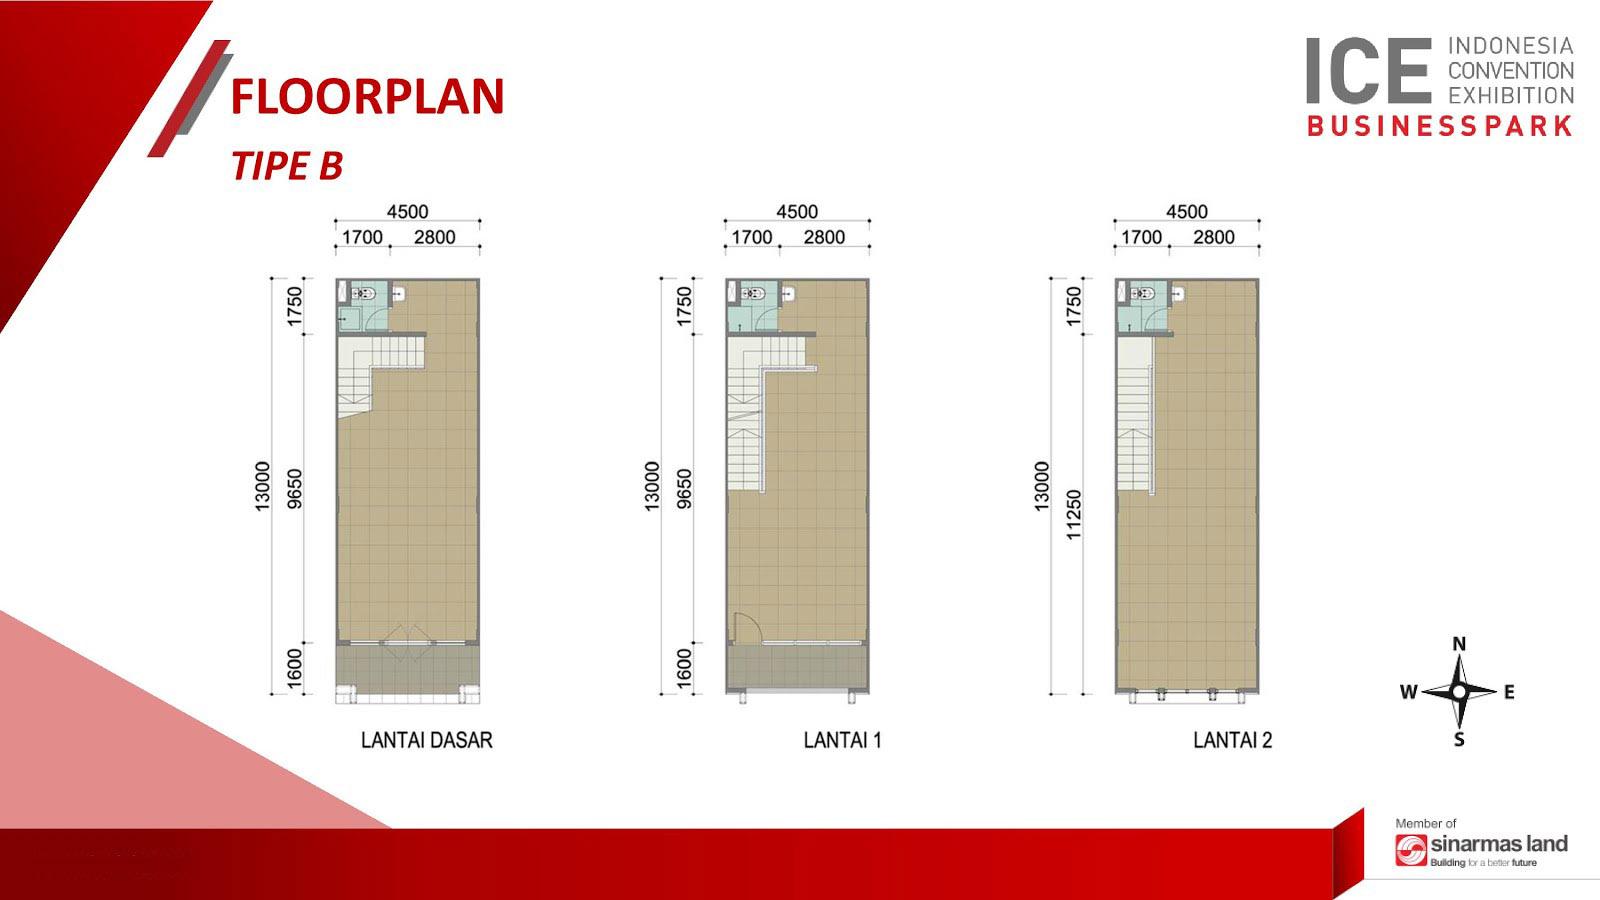 Blokplan Ruko ICE Business Park BSD - Tipe B